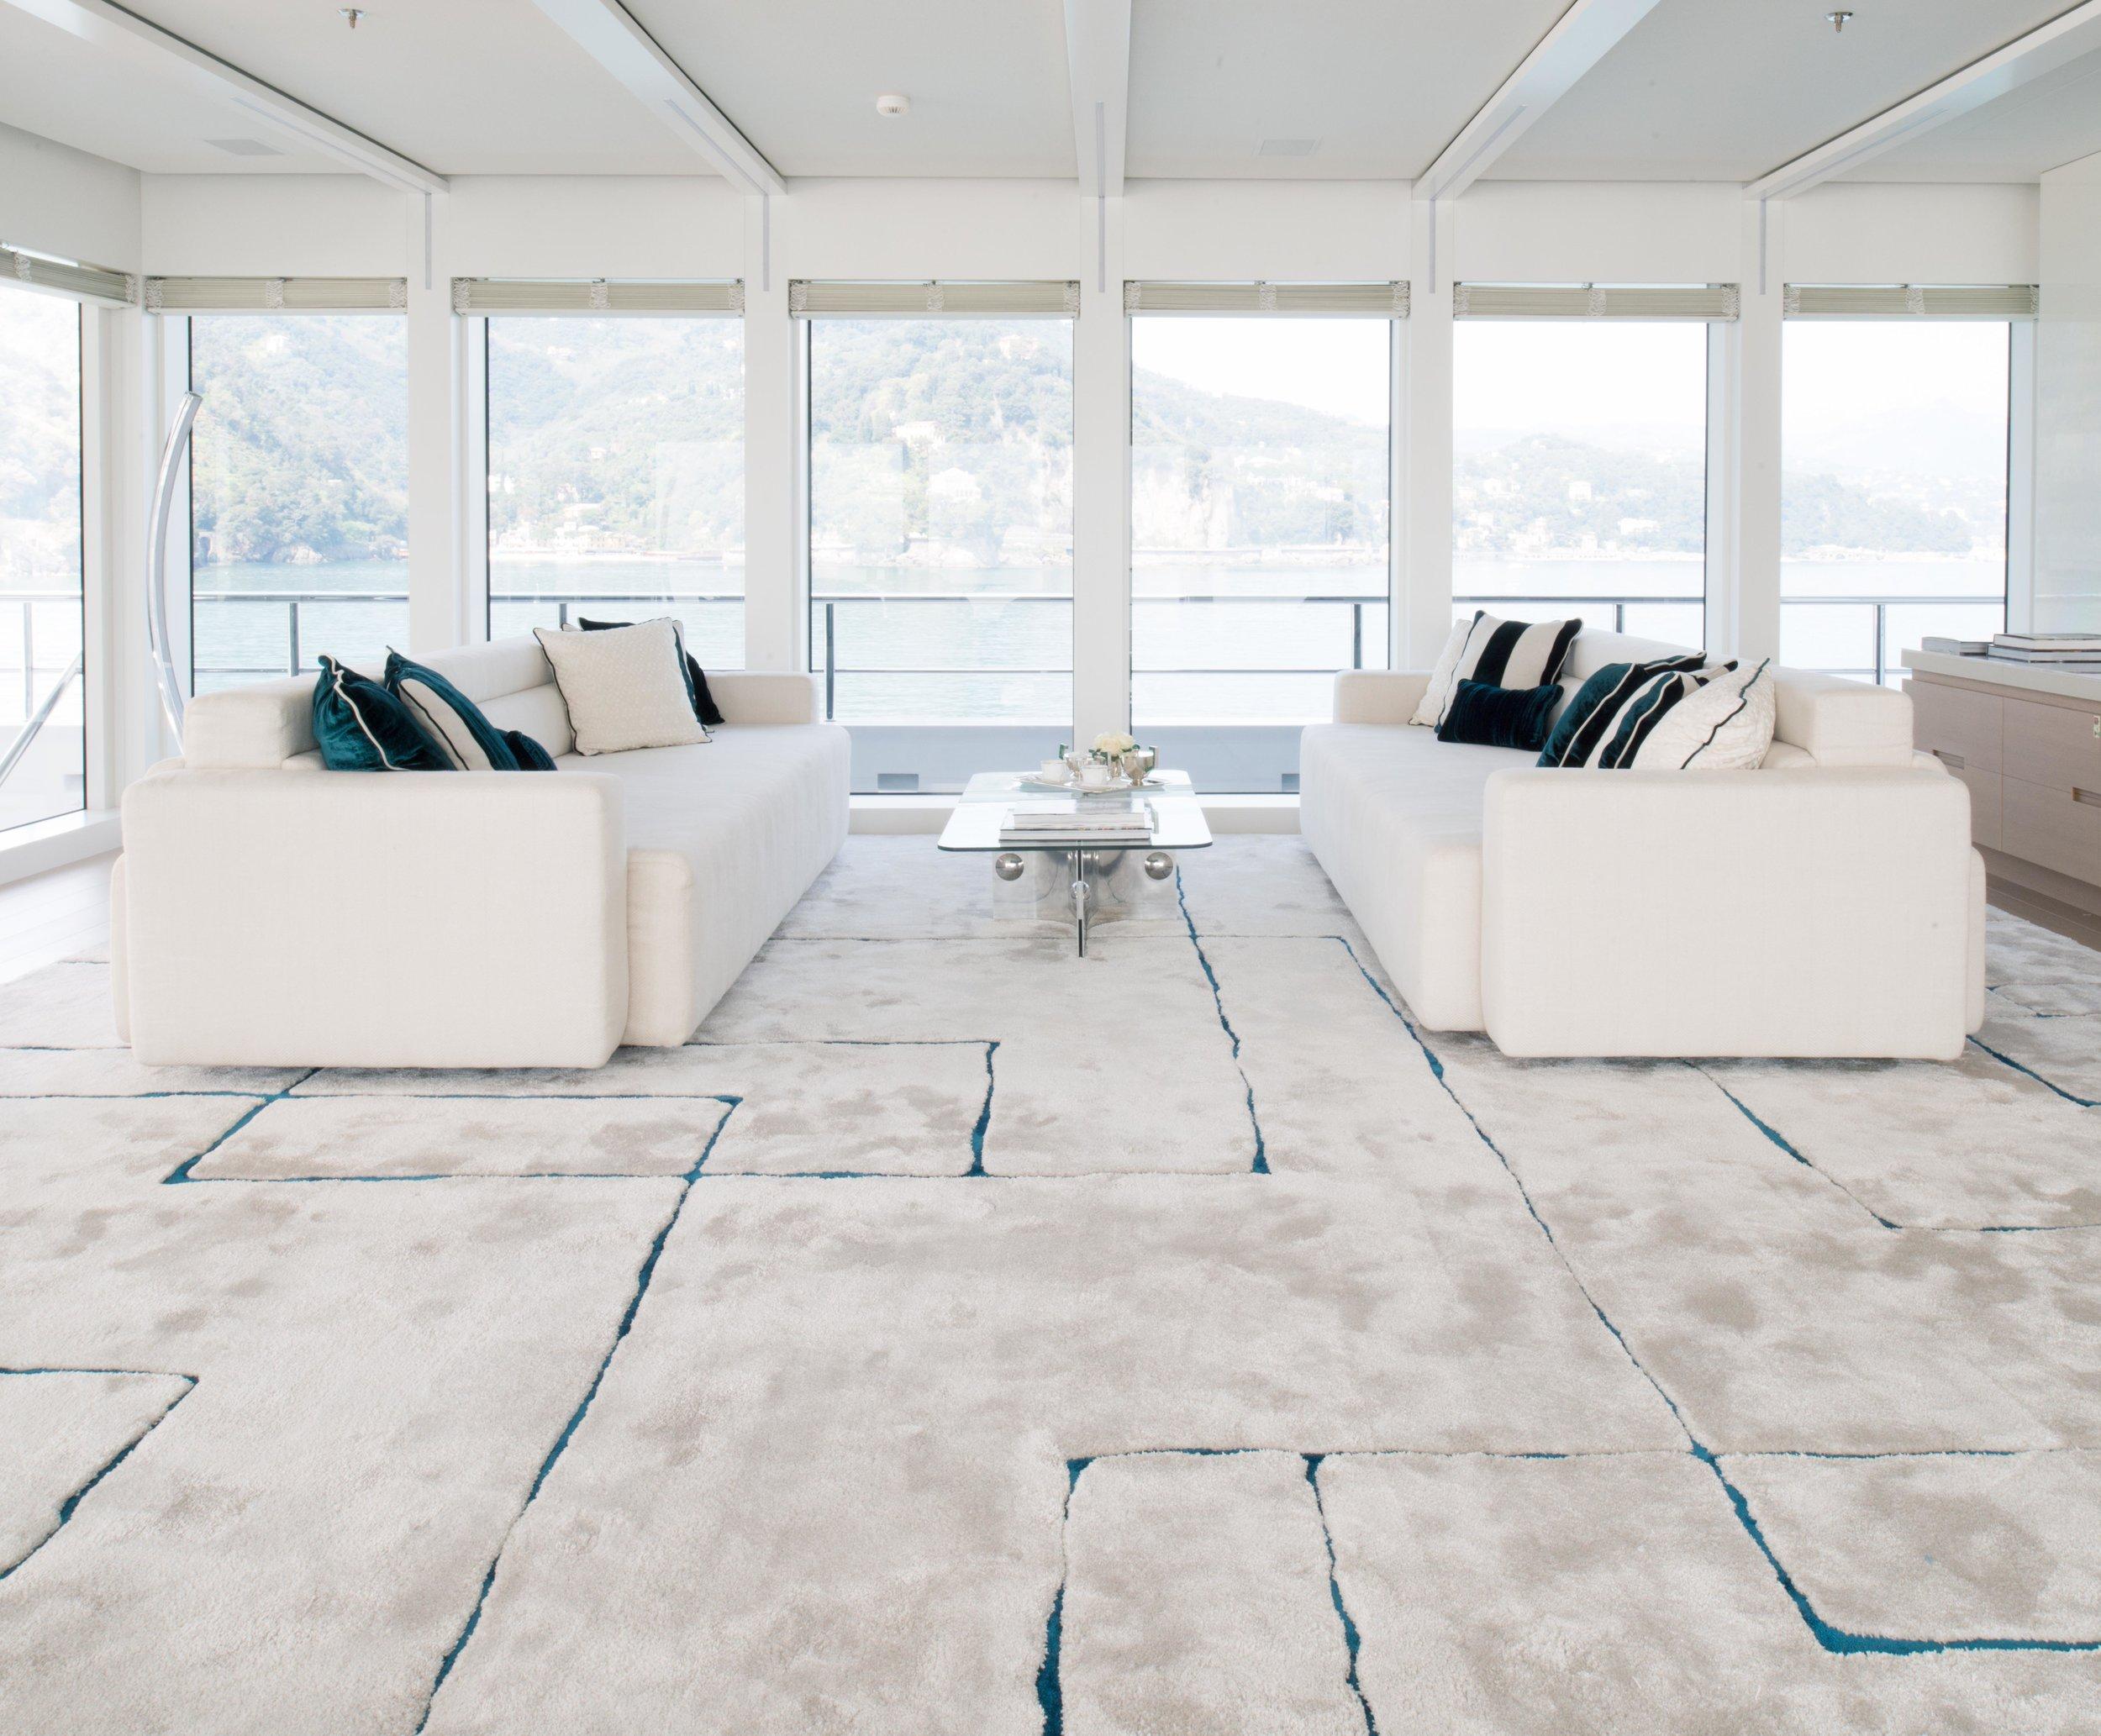 About Tai Ping Yacht